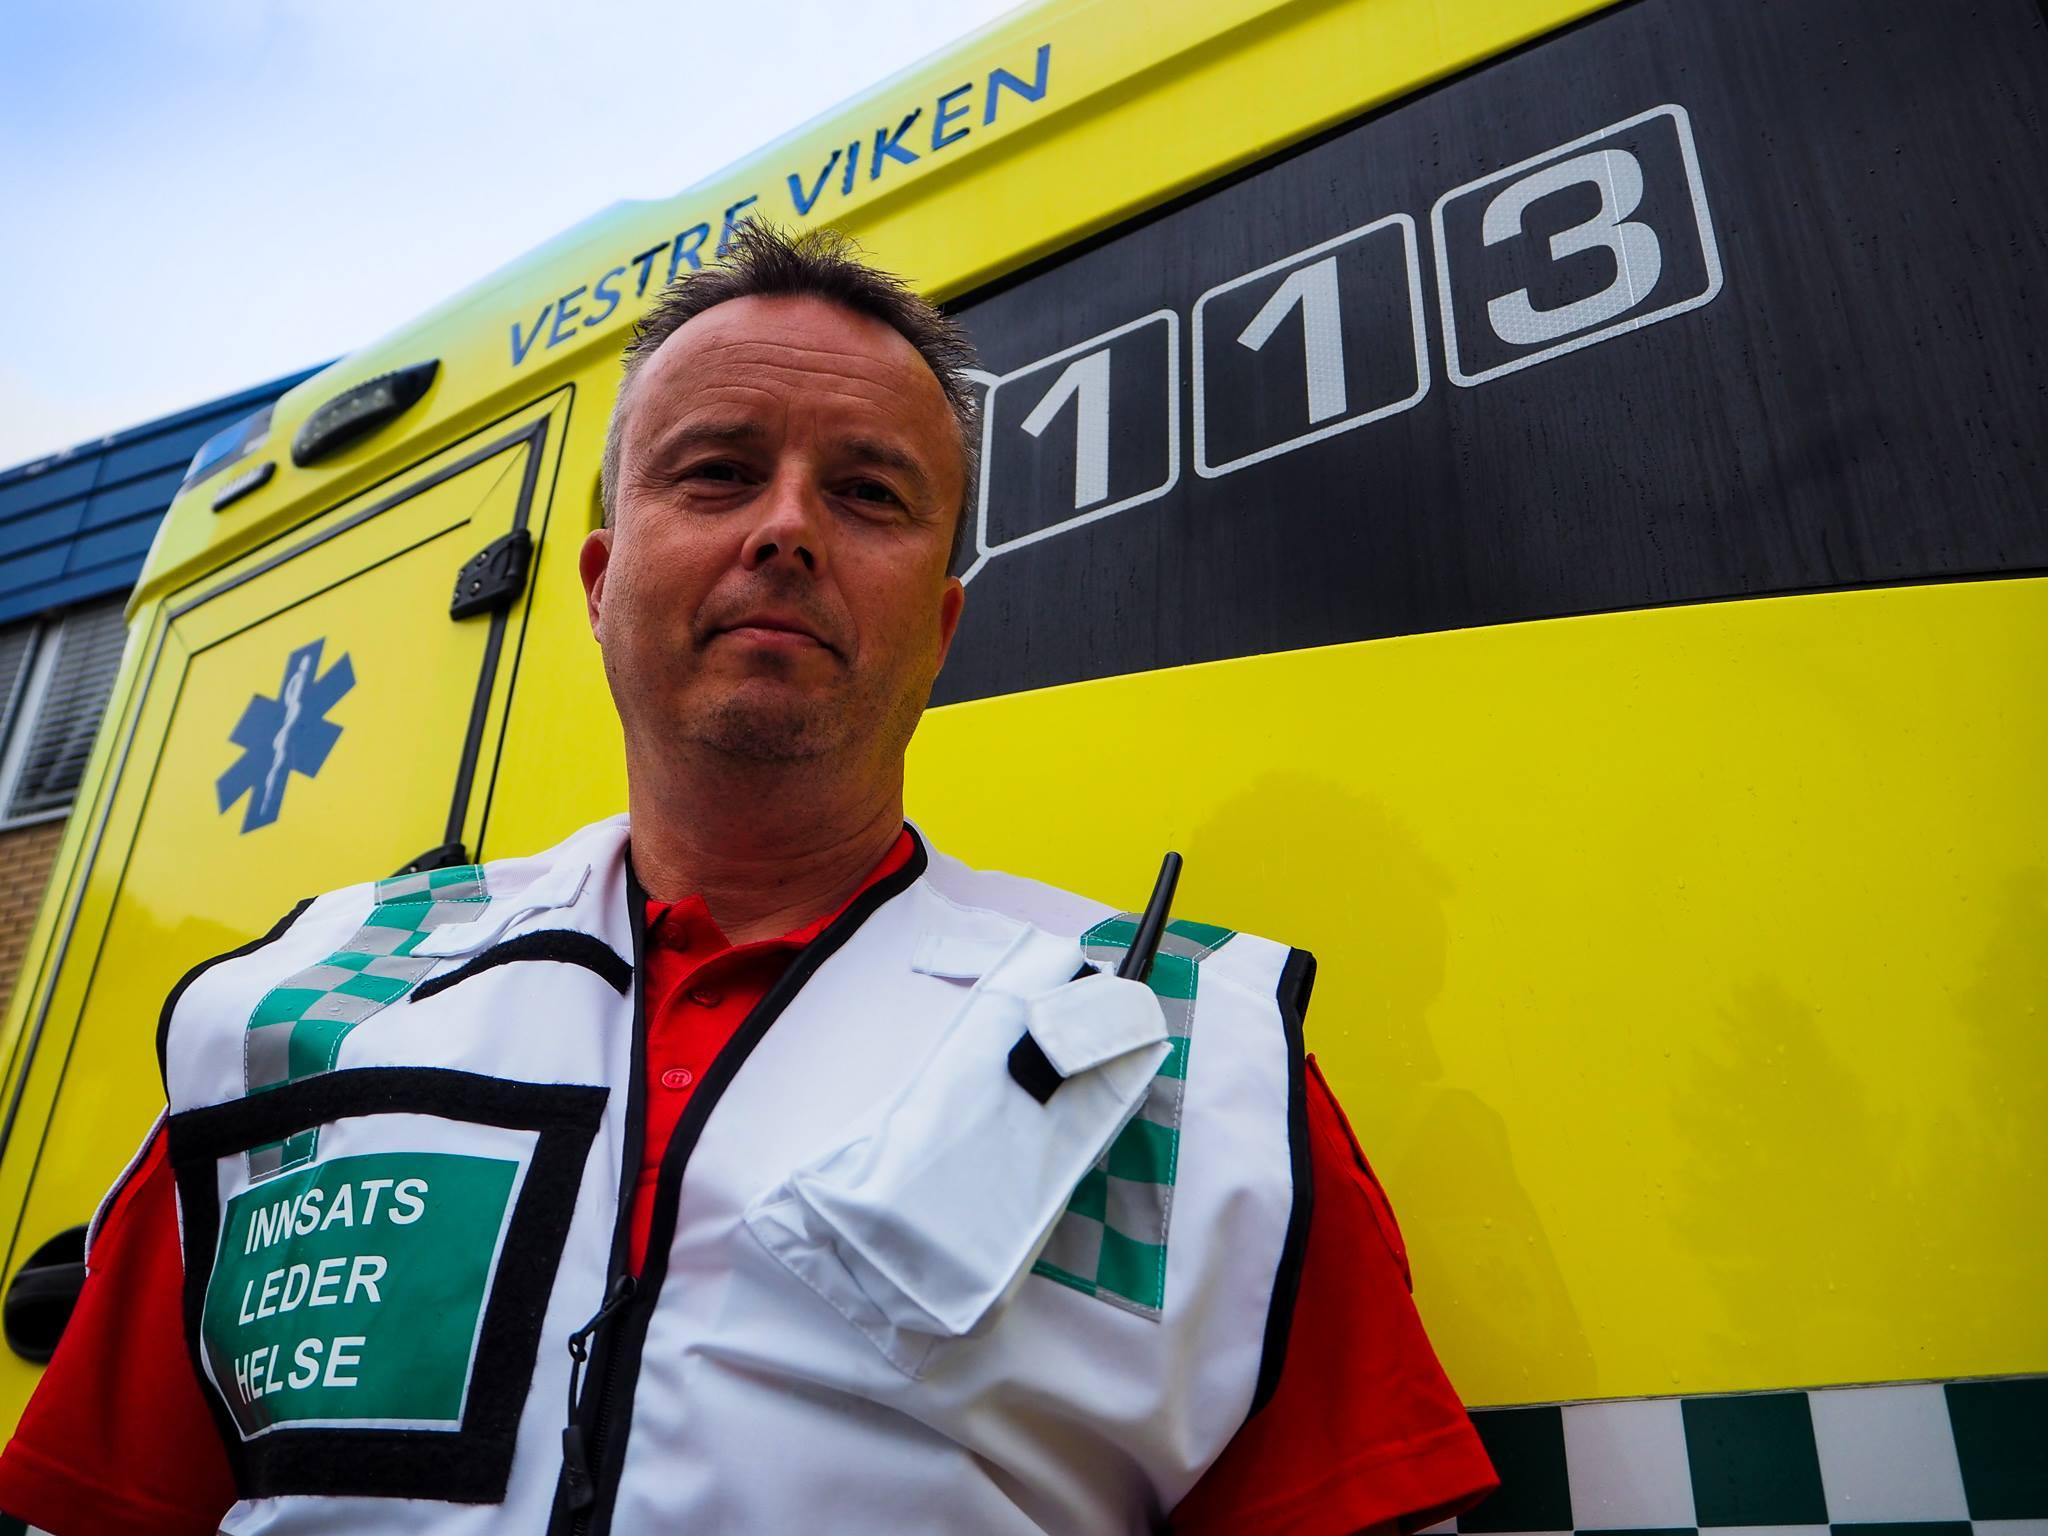 Håvard Larsen, paramedic i Vestre Viken. Foto: Ole Kristian Andreassen